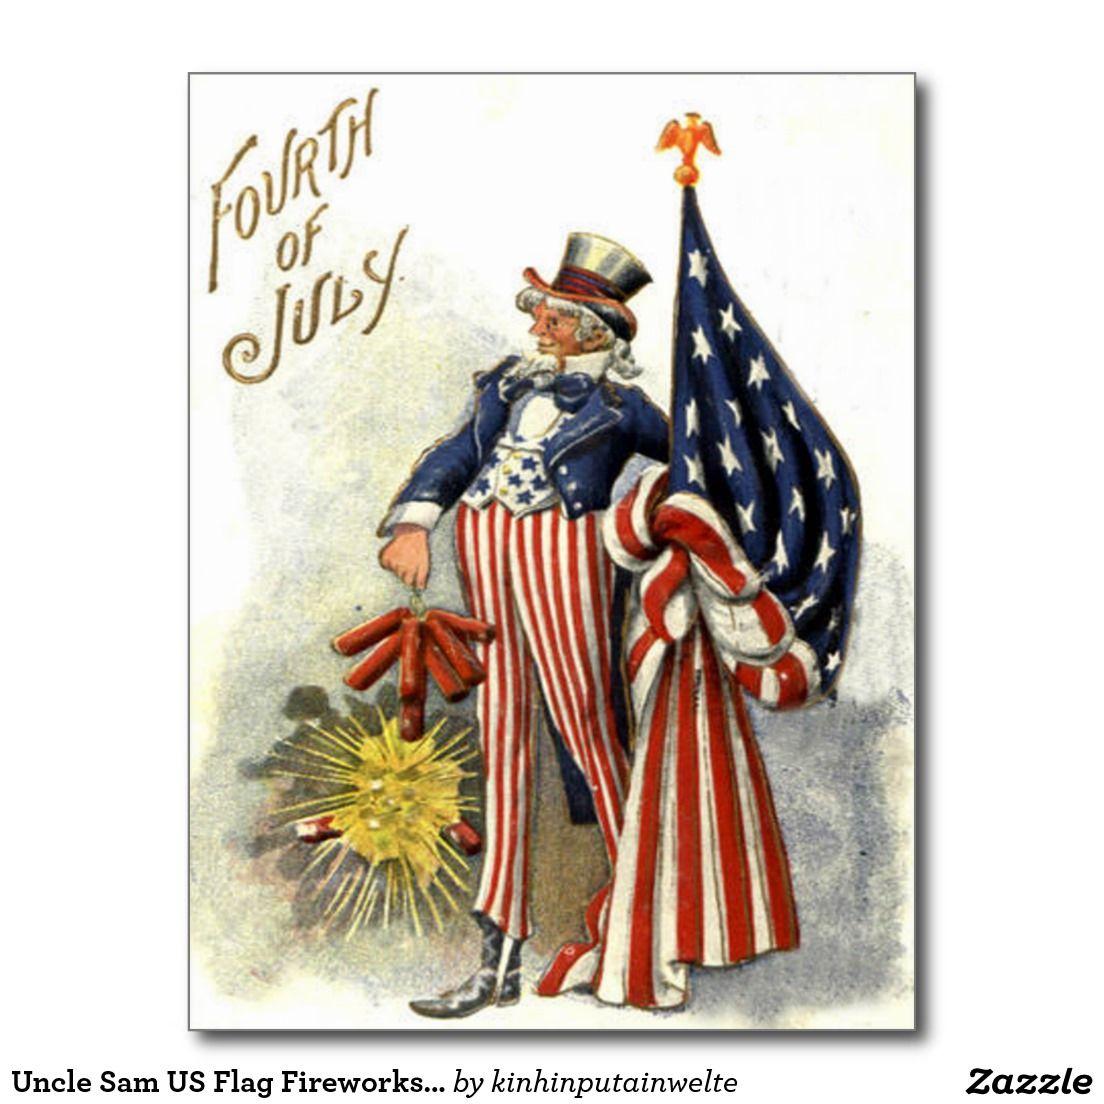 4th of July Flag and Fireworks Vintage Image Download Printable